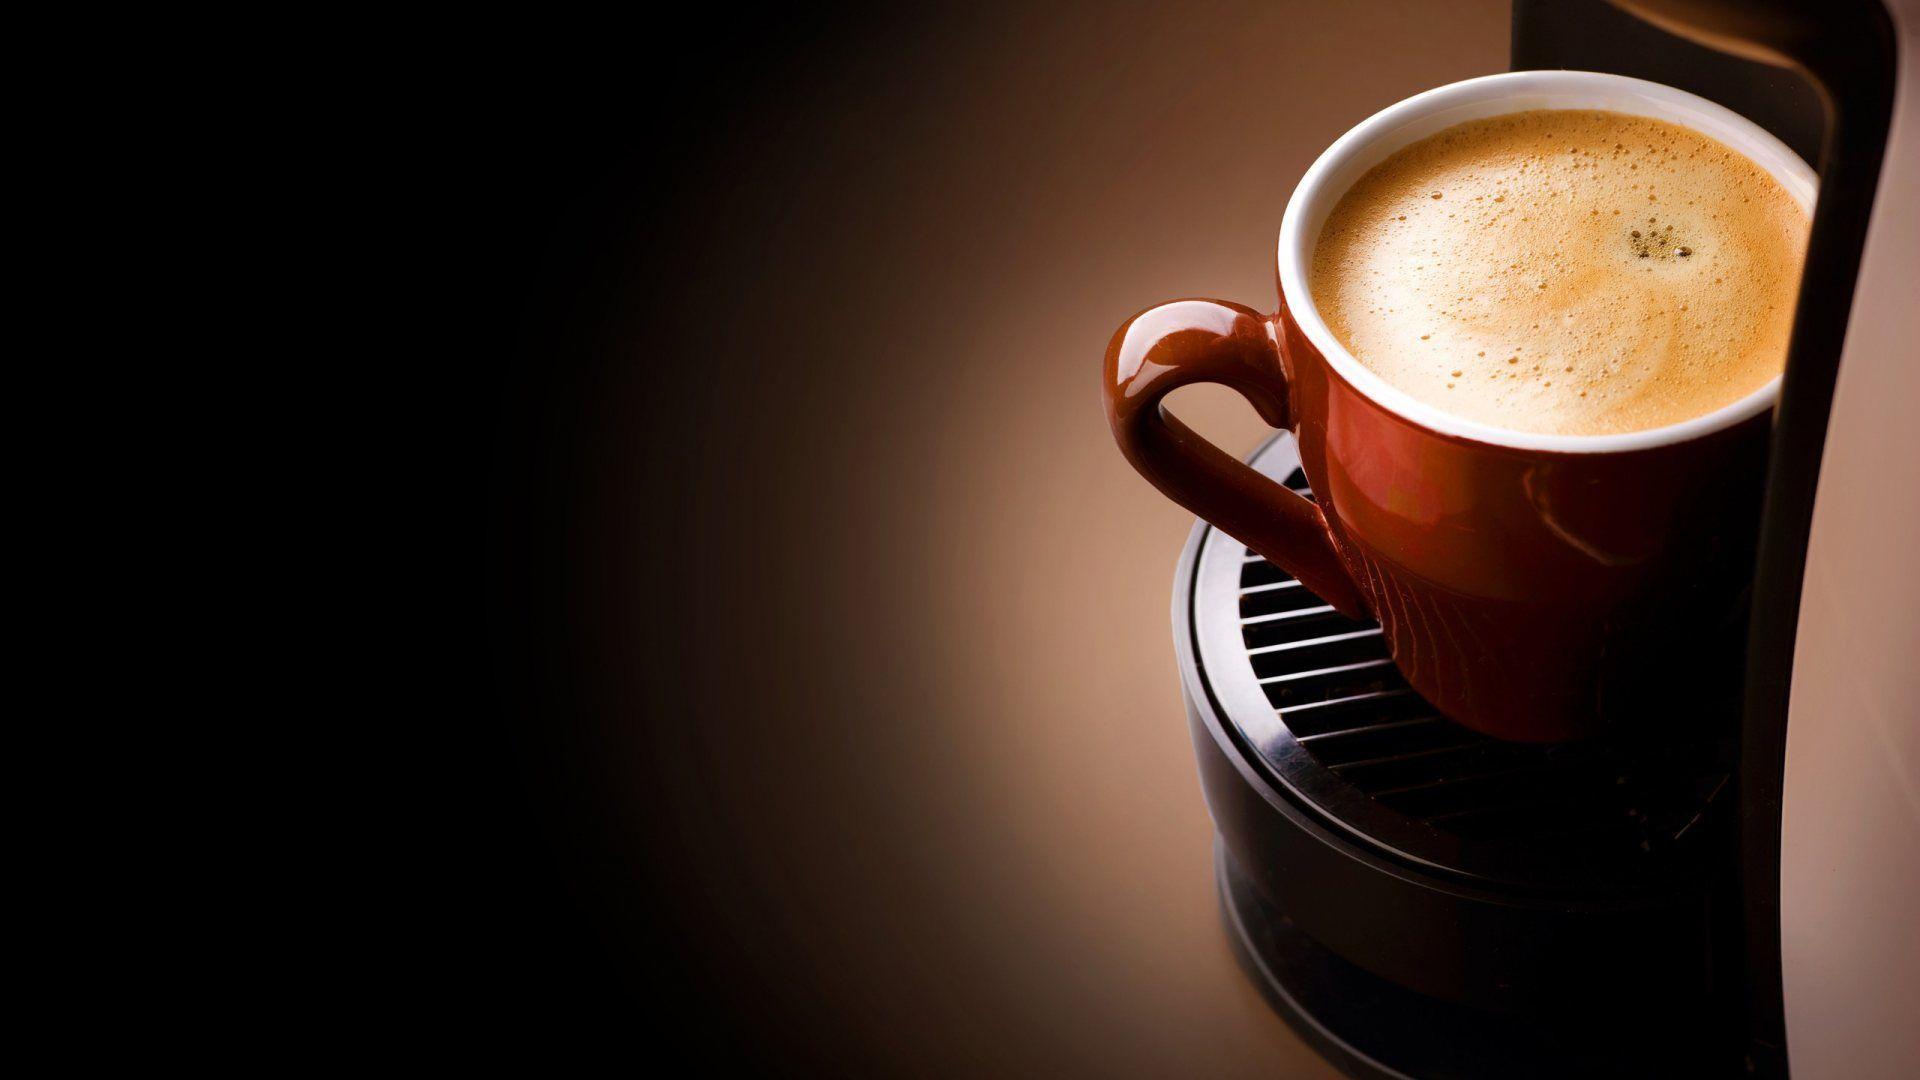 Coffee Cup Wallpaper 6609 Full Hd Wallpaper Desktop Res